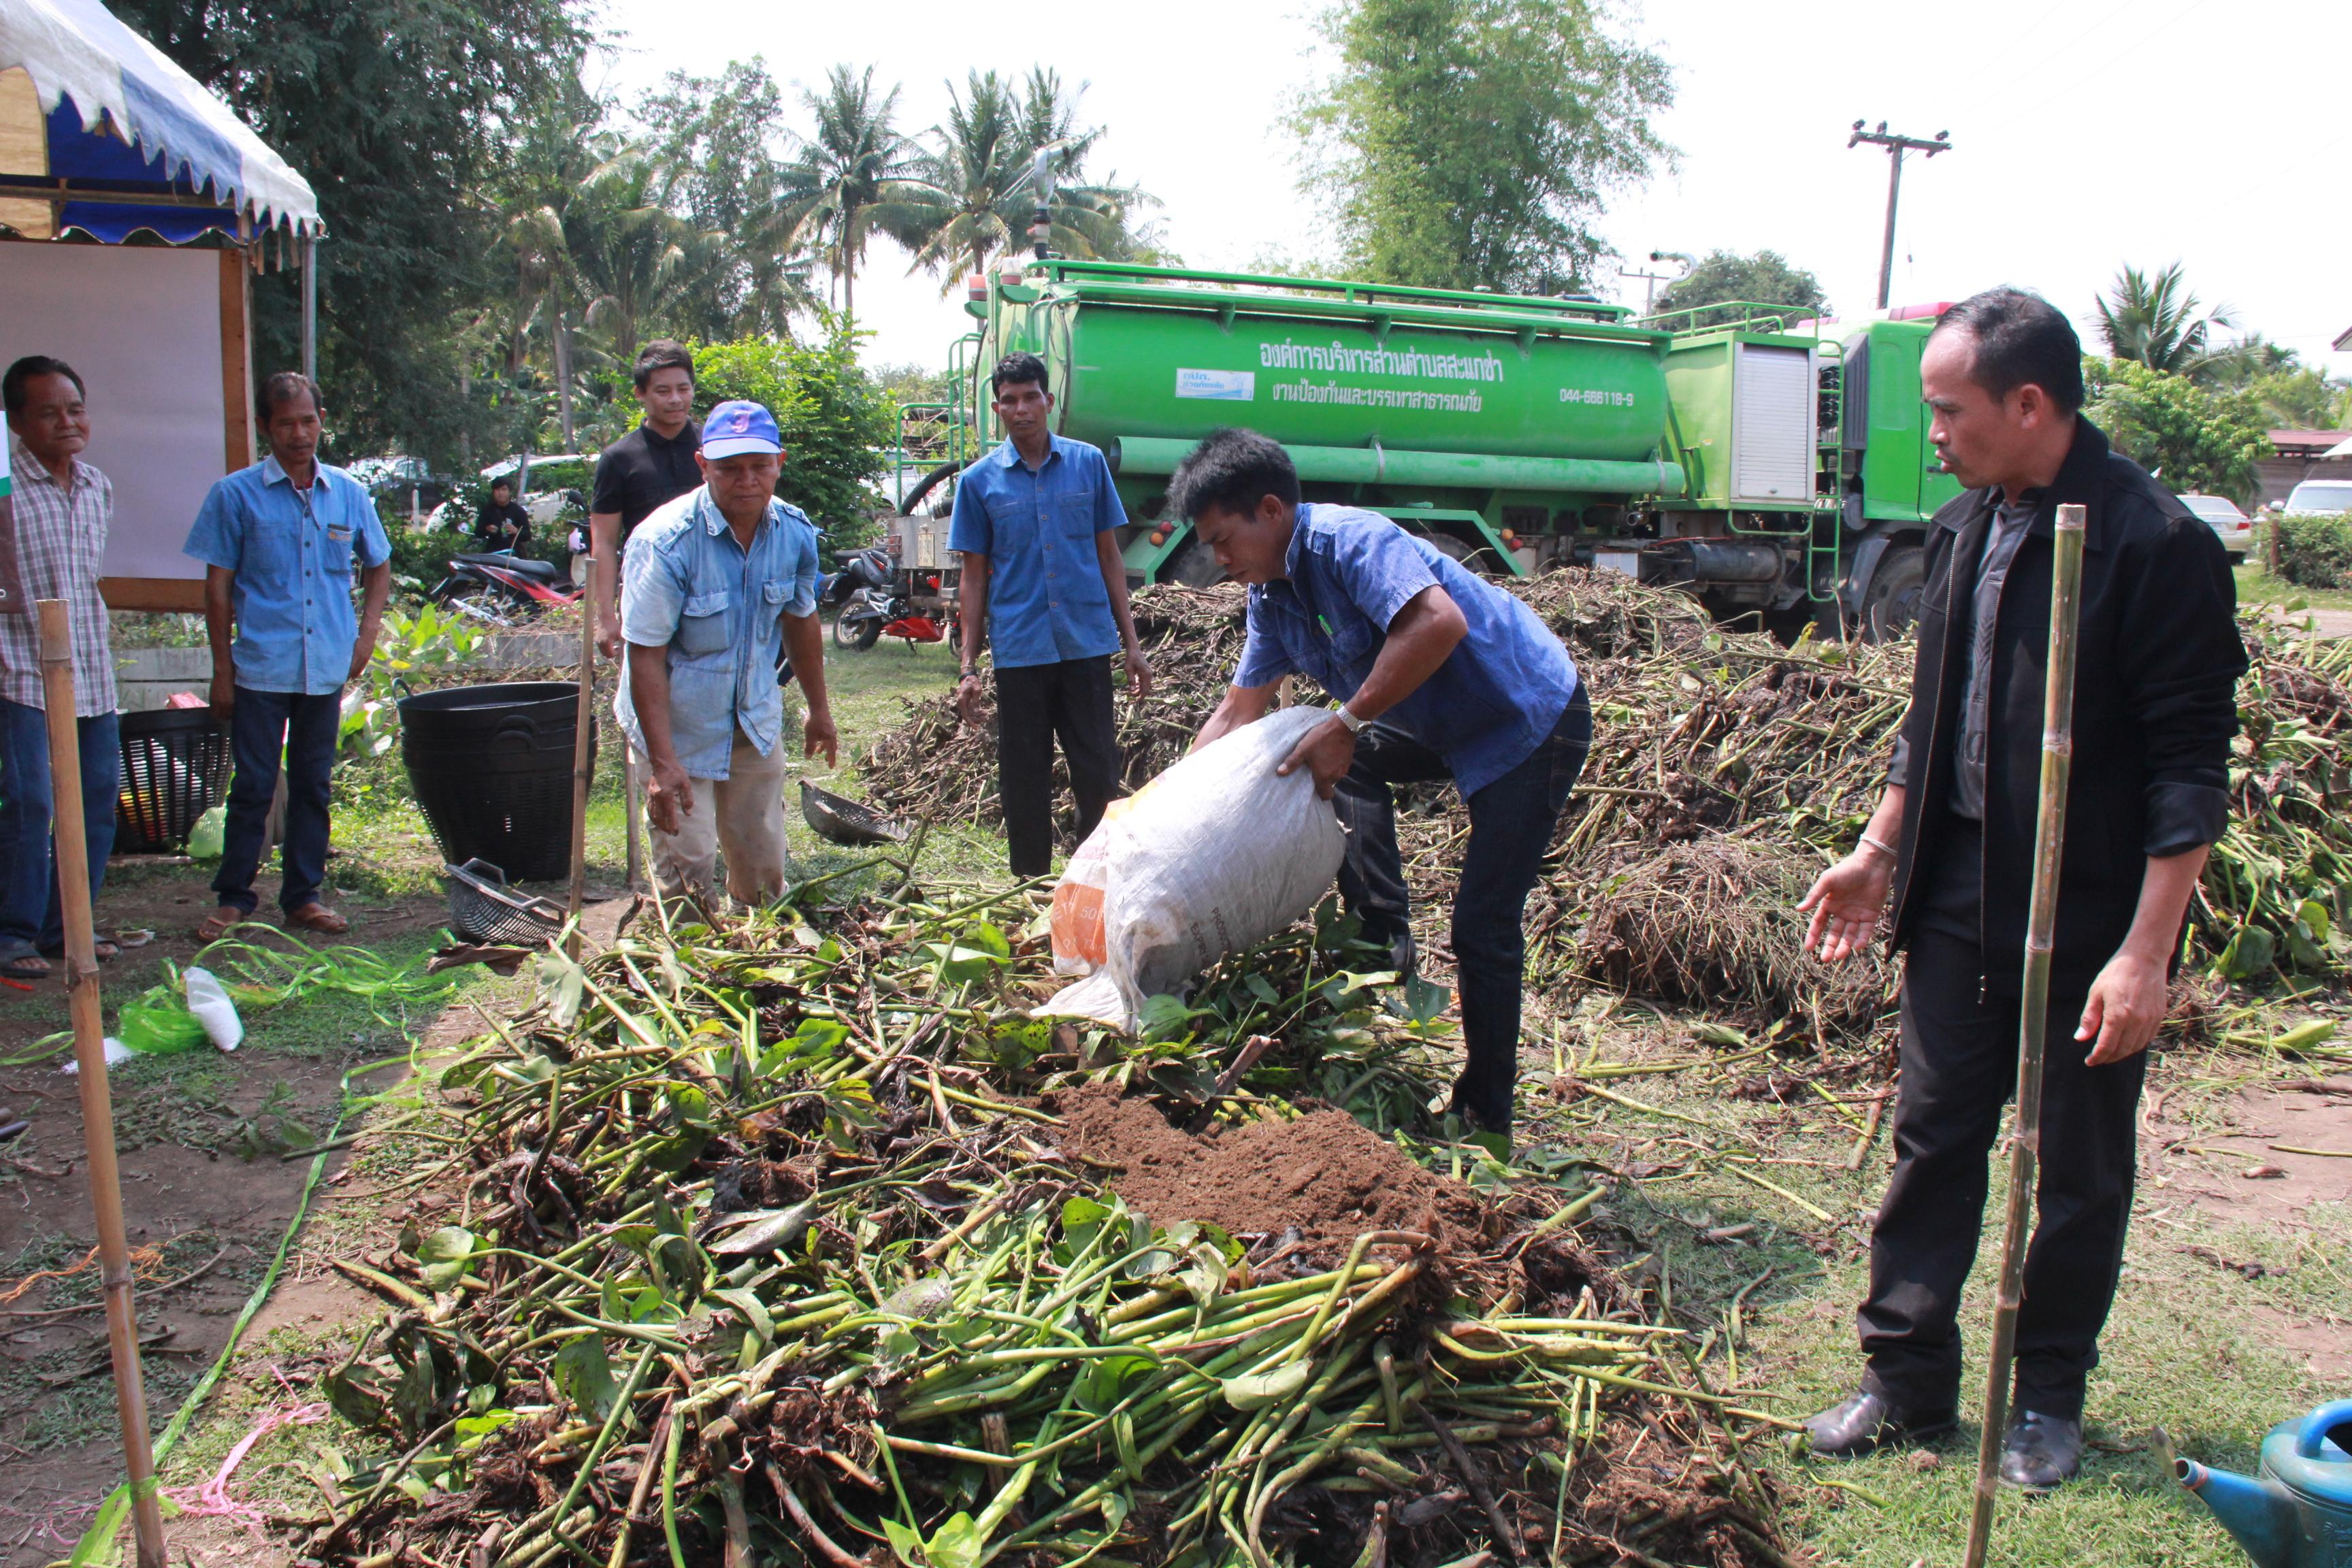 Thailand News 27-03-17 2 NNT Buriram launches canal cleanup to boost water storage 1JPG